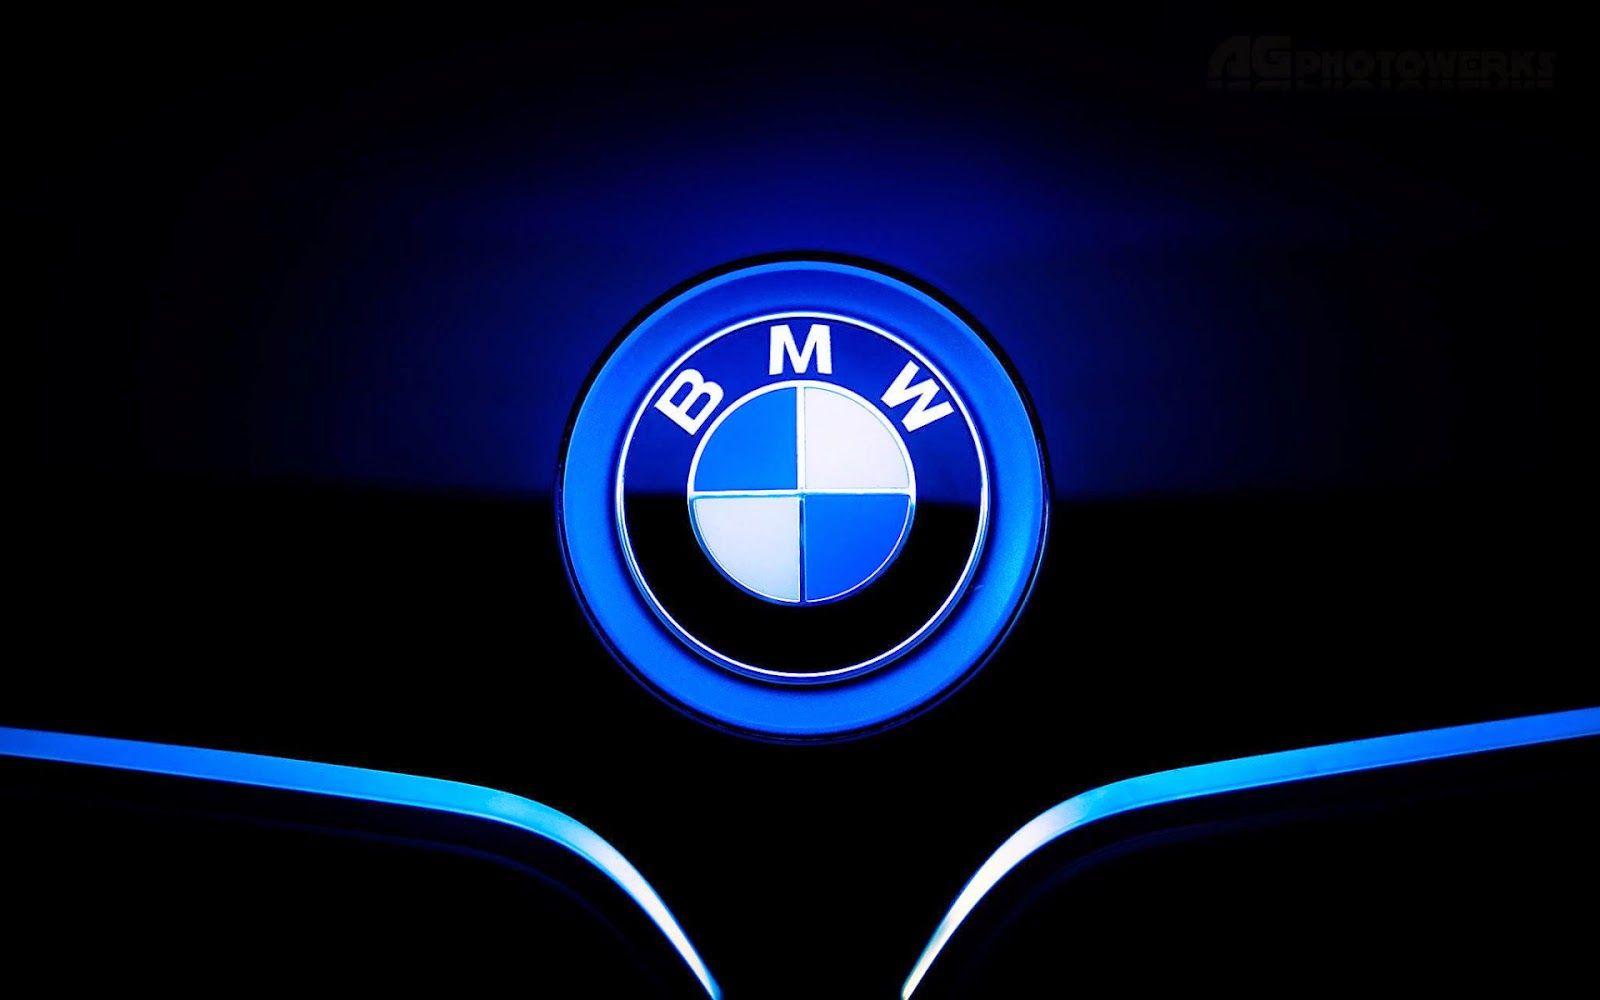 BMW M confirms 'electrification' development for large models, no plans of 'hybrid' M2, M3 or M4